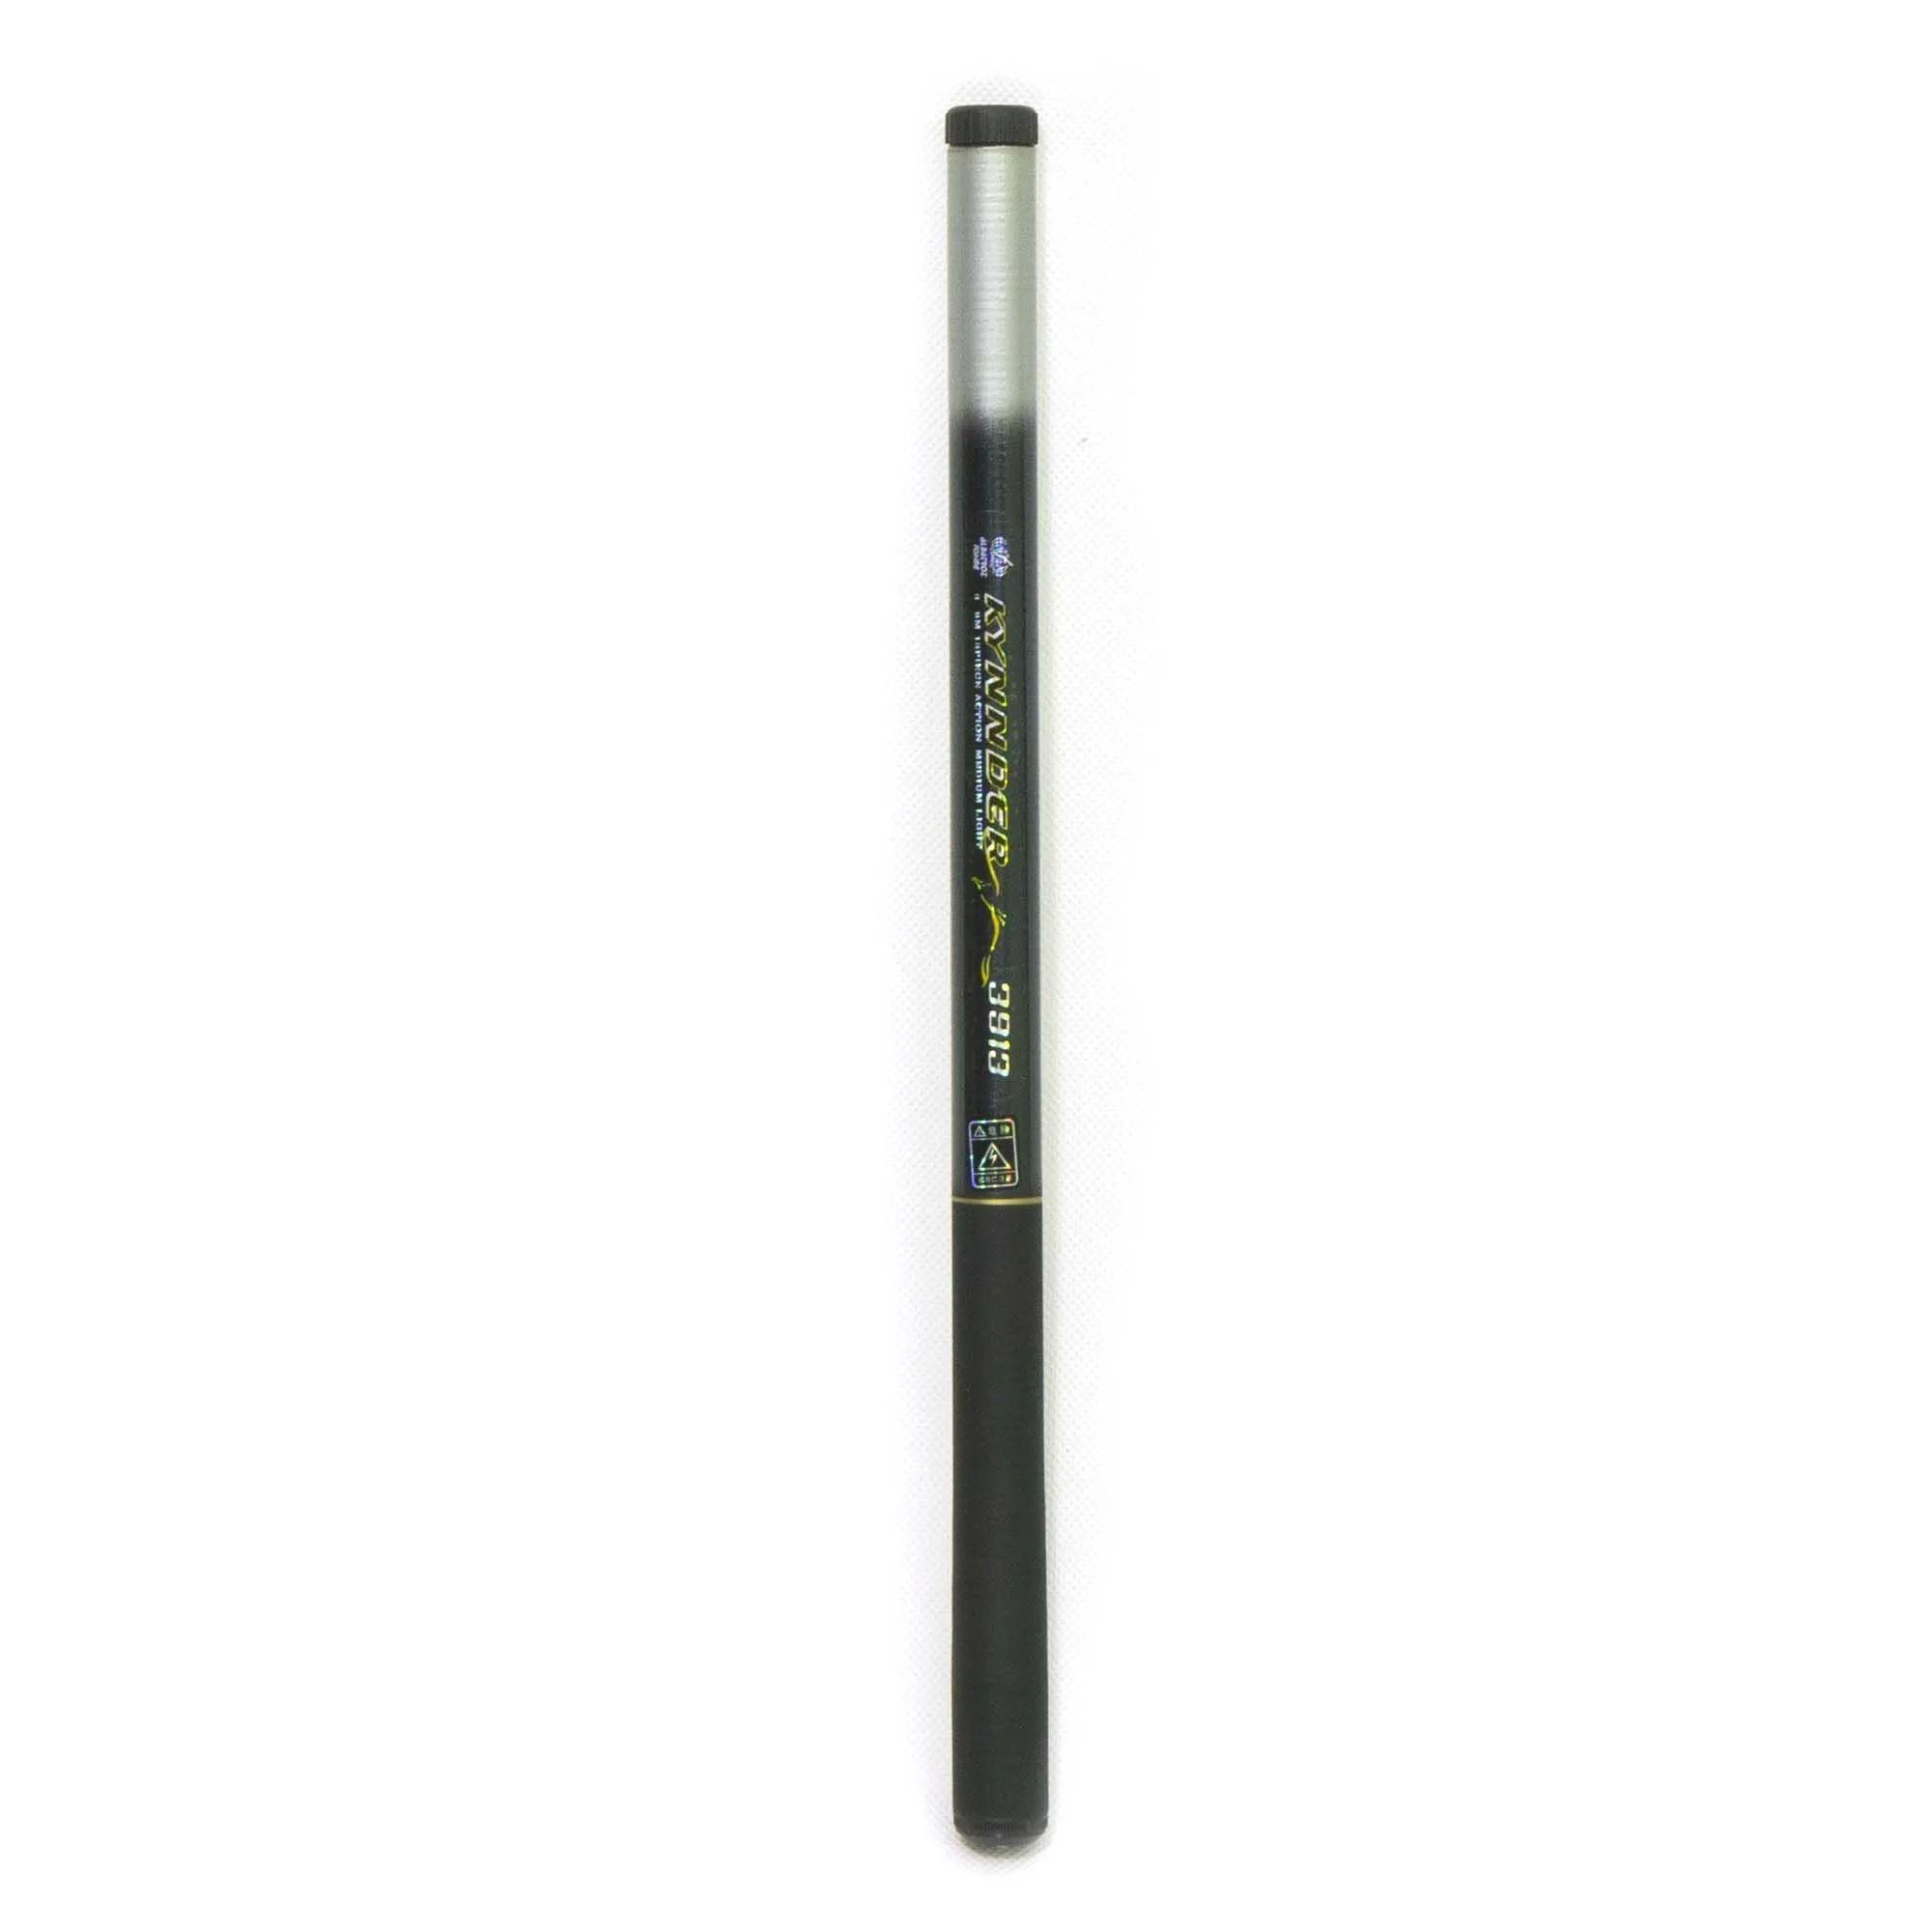 Vara Telescópica uso sem Molinete Kynnder 45% Carbono 3,30m - 11P  - Artpesca